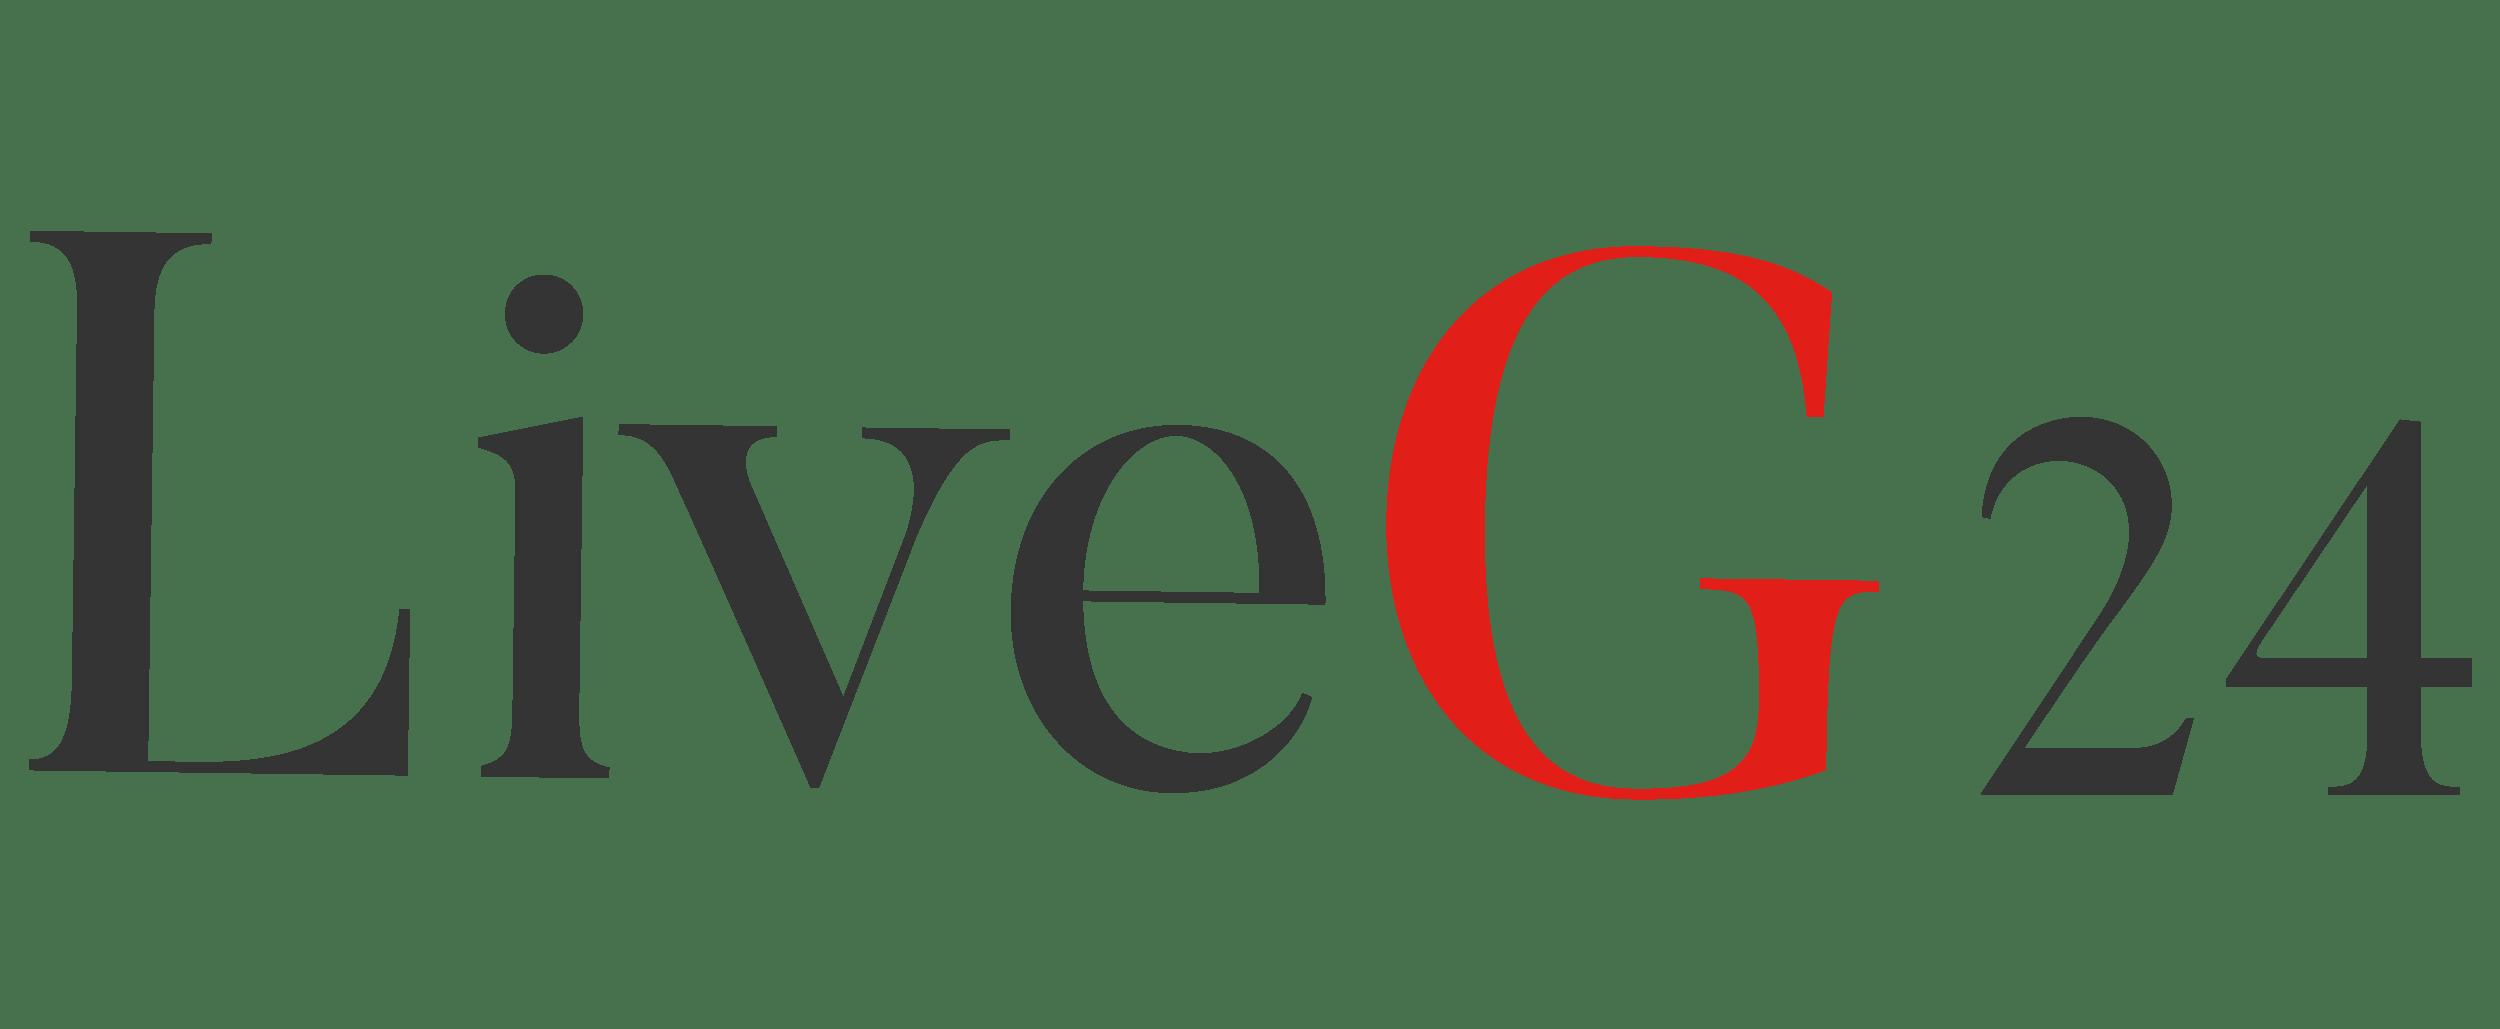 LiveG24 Spiele